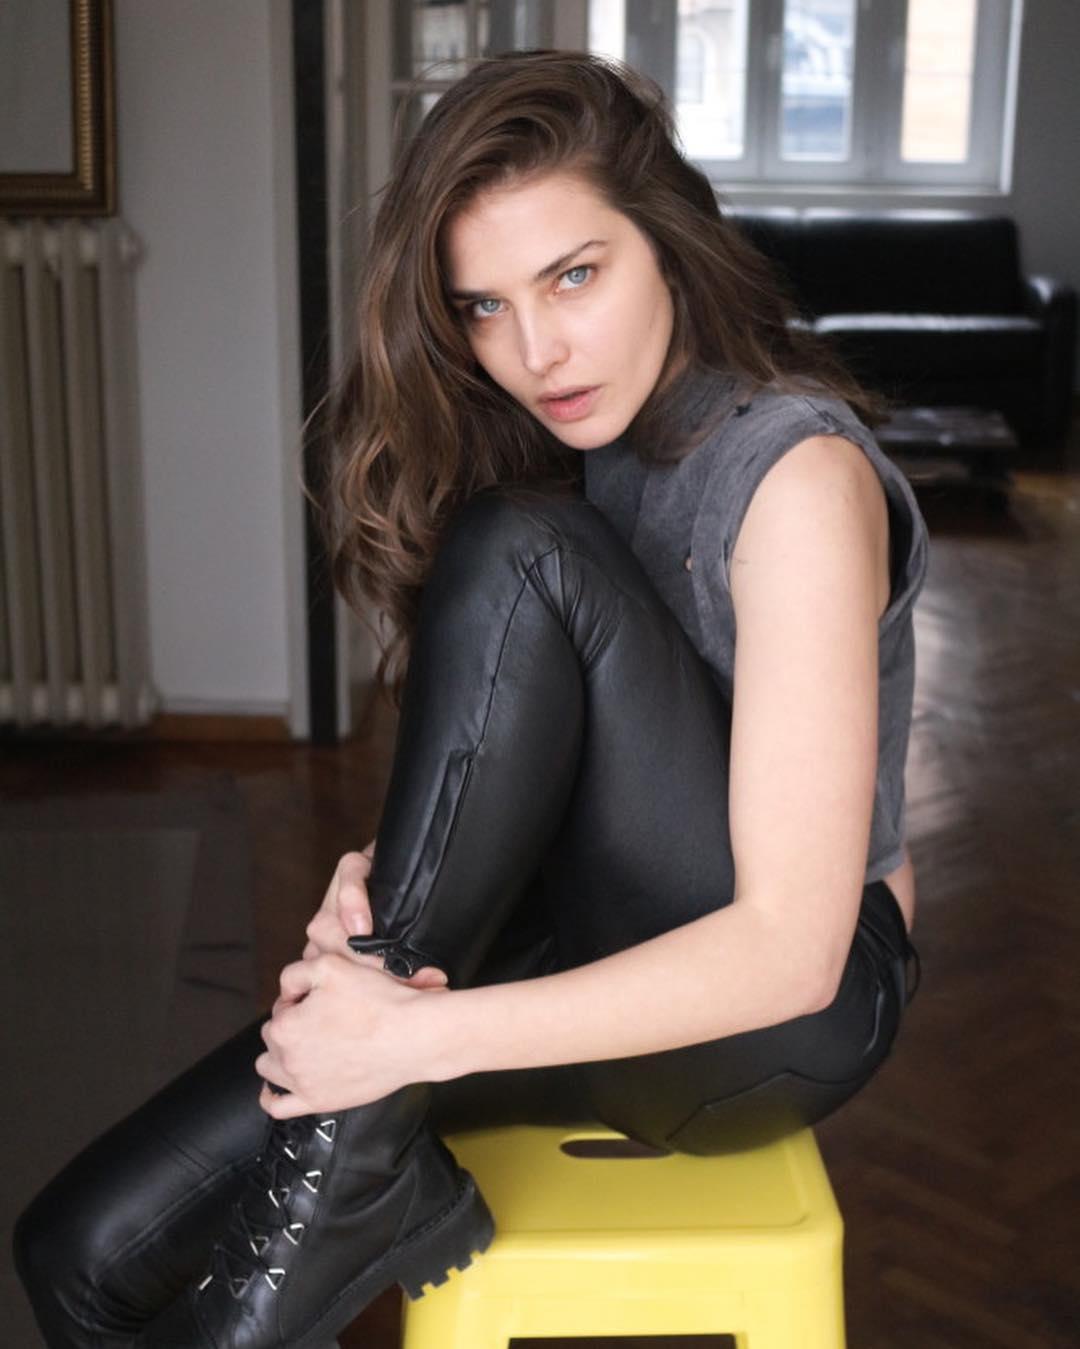 Tamara-Lazic-Wallpapers-Insta-Fit-Bio-4